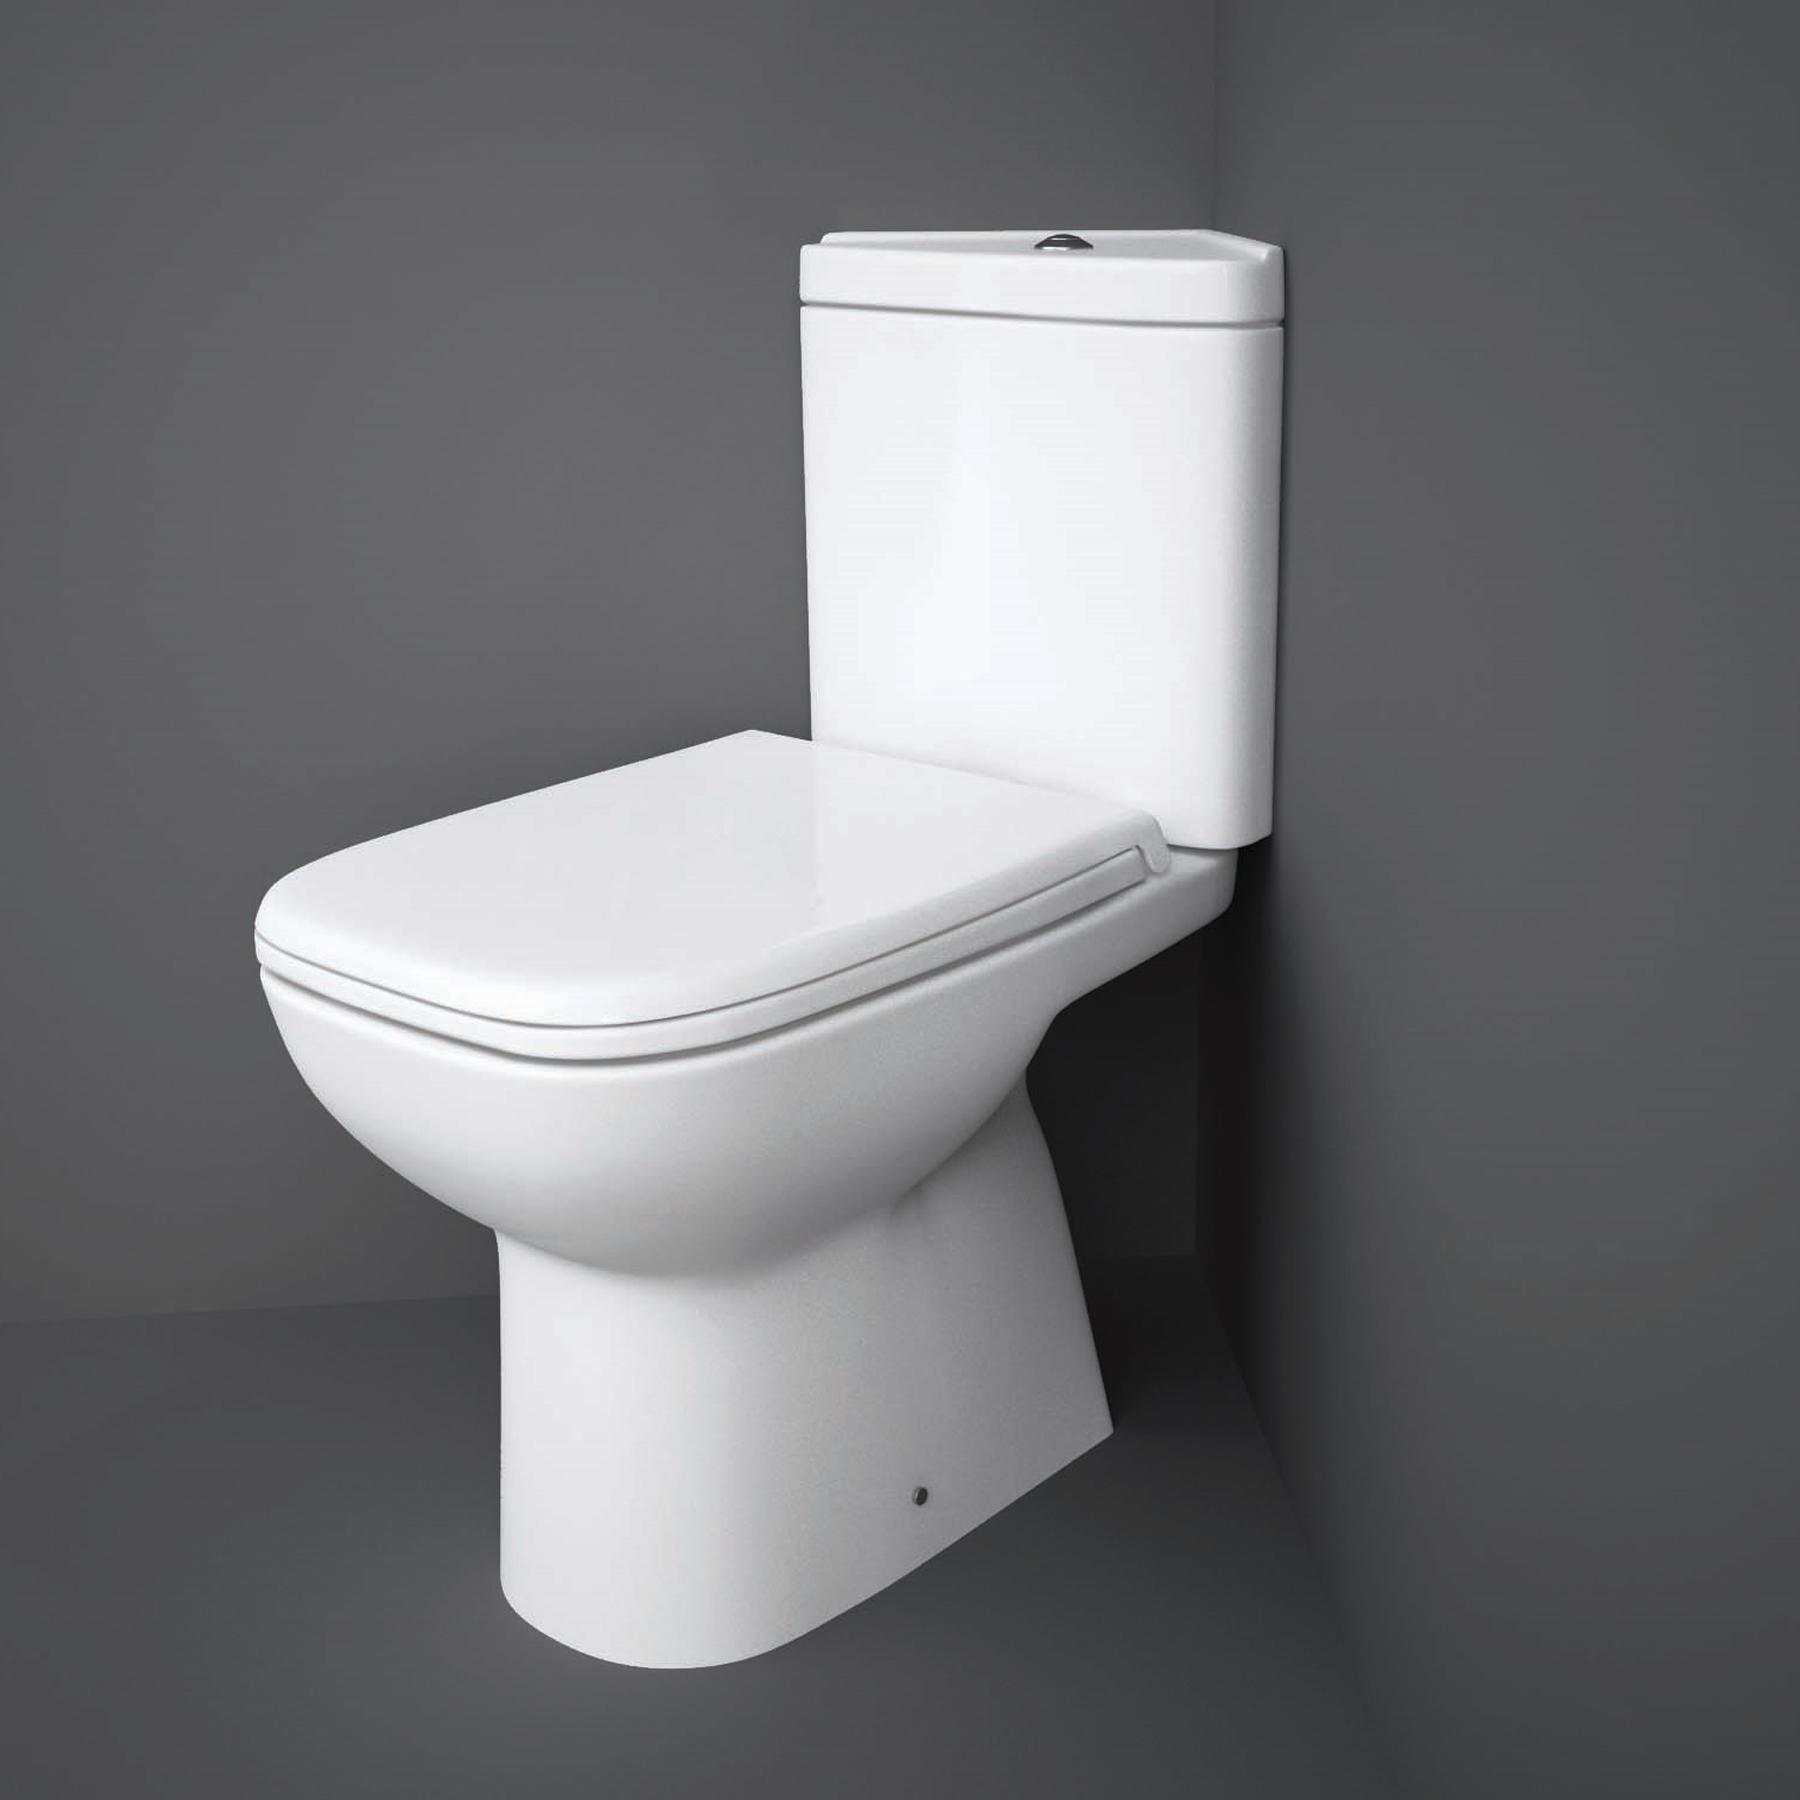 RAK Origin 62 Corner Full Access Close Coupled Toilet - Urea Soft Close Seat